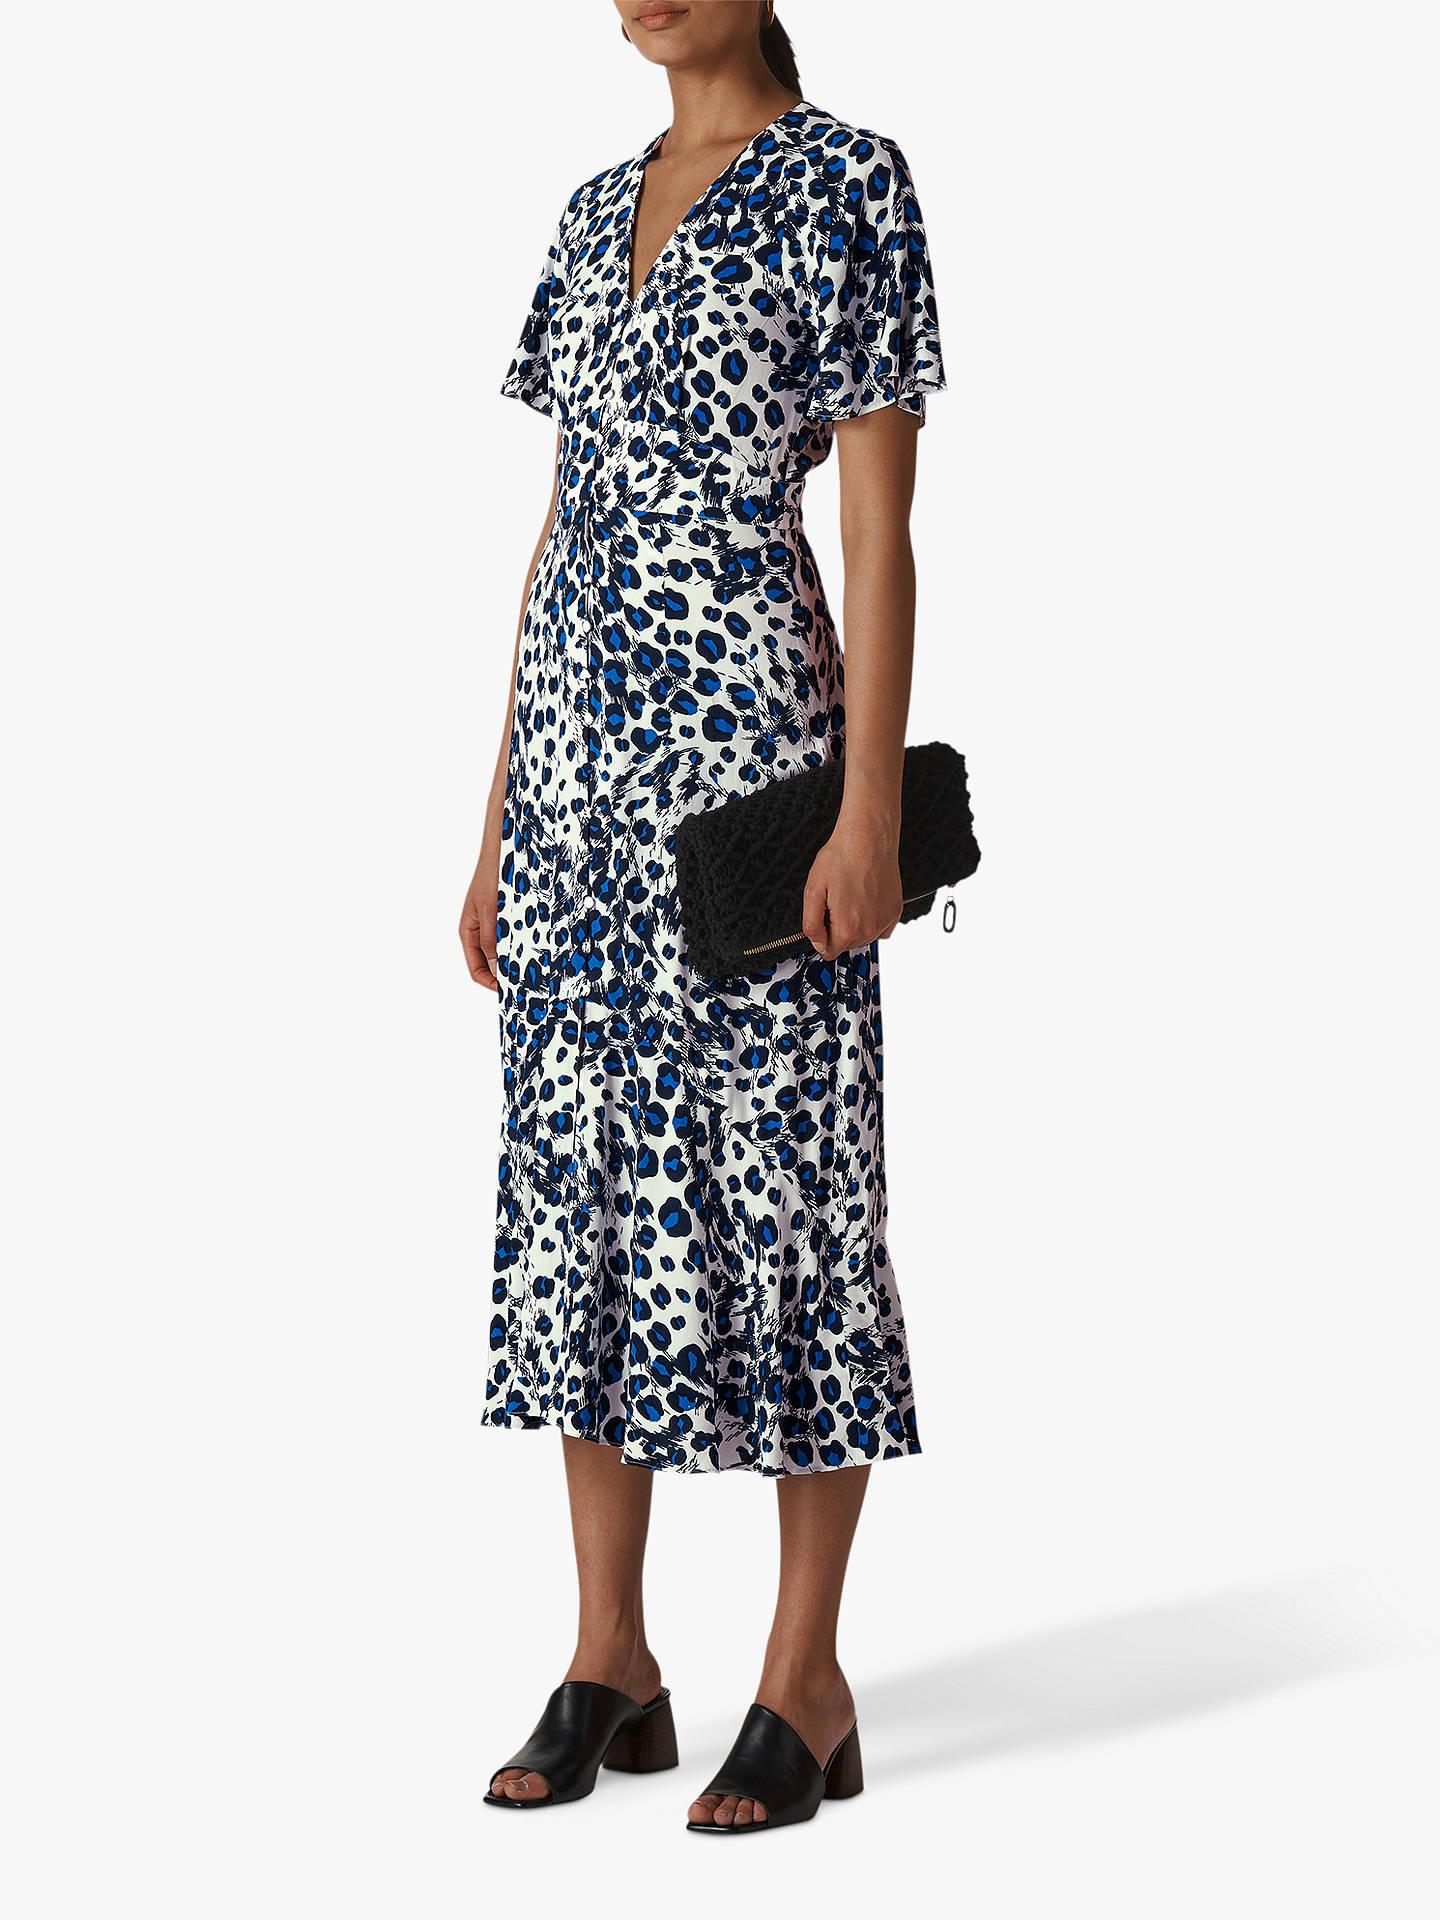 5231ef647462 Buy Whistles Brushed Leopard Button Dress, Blue/Multi, 6 Online at  johnlewis.